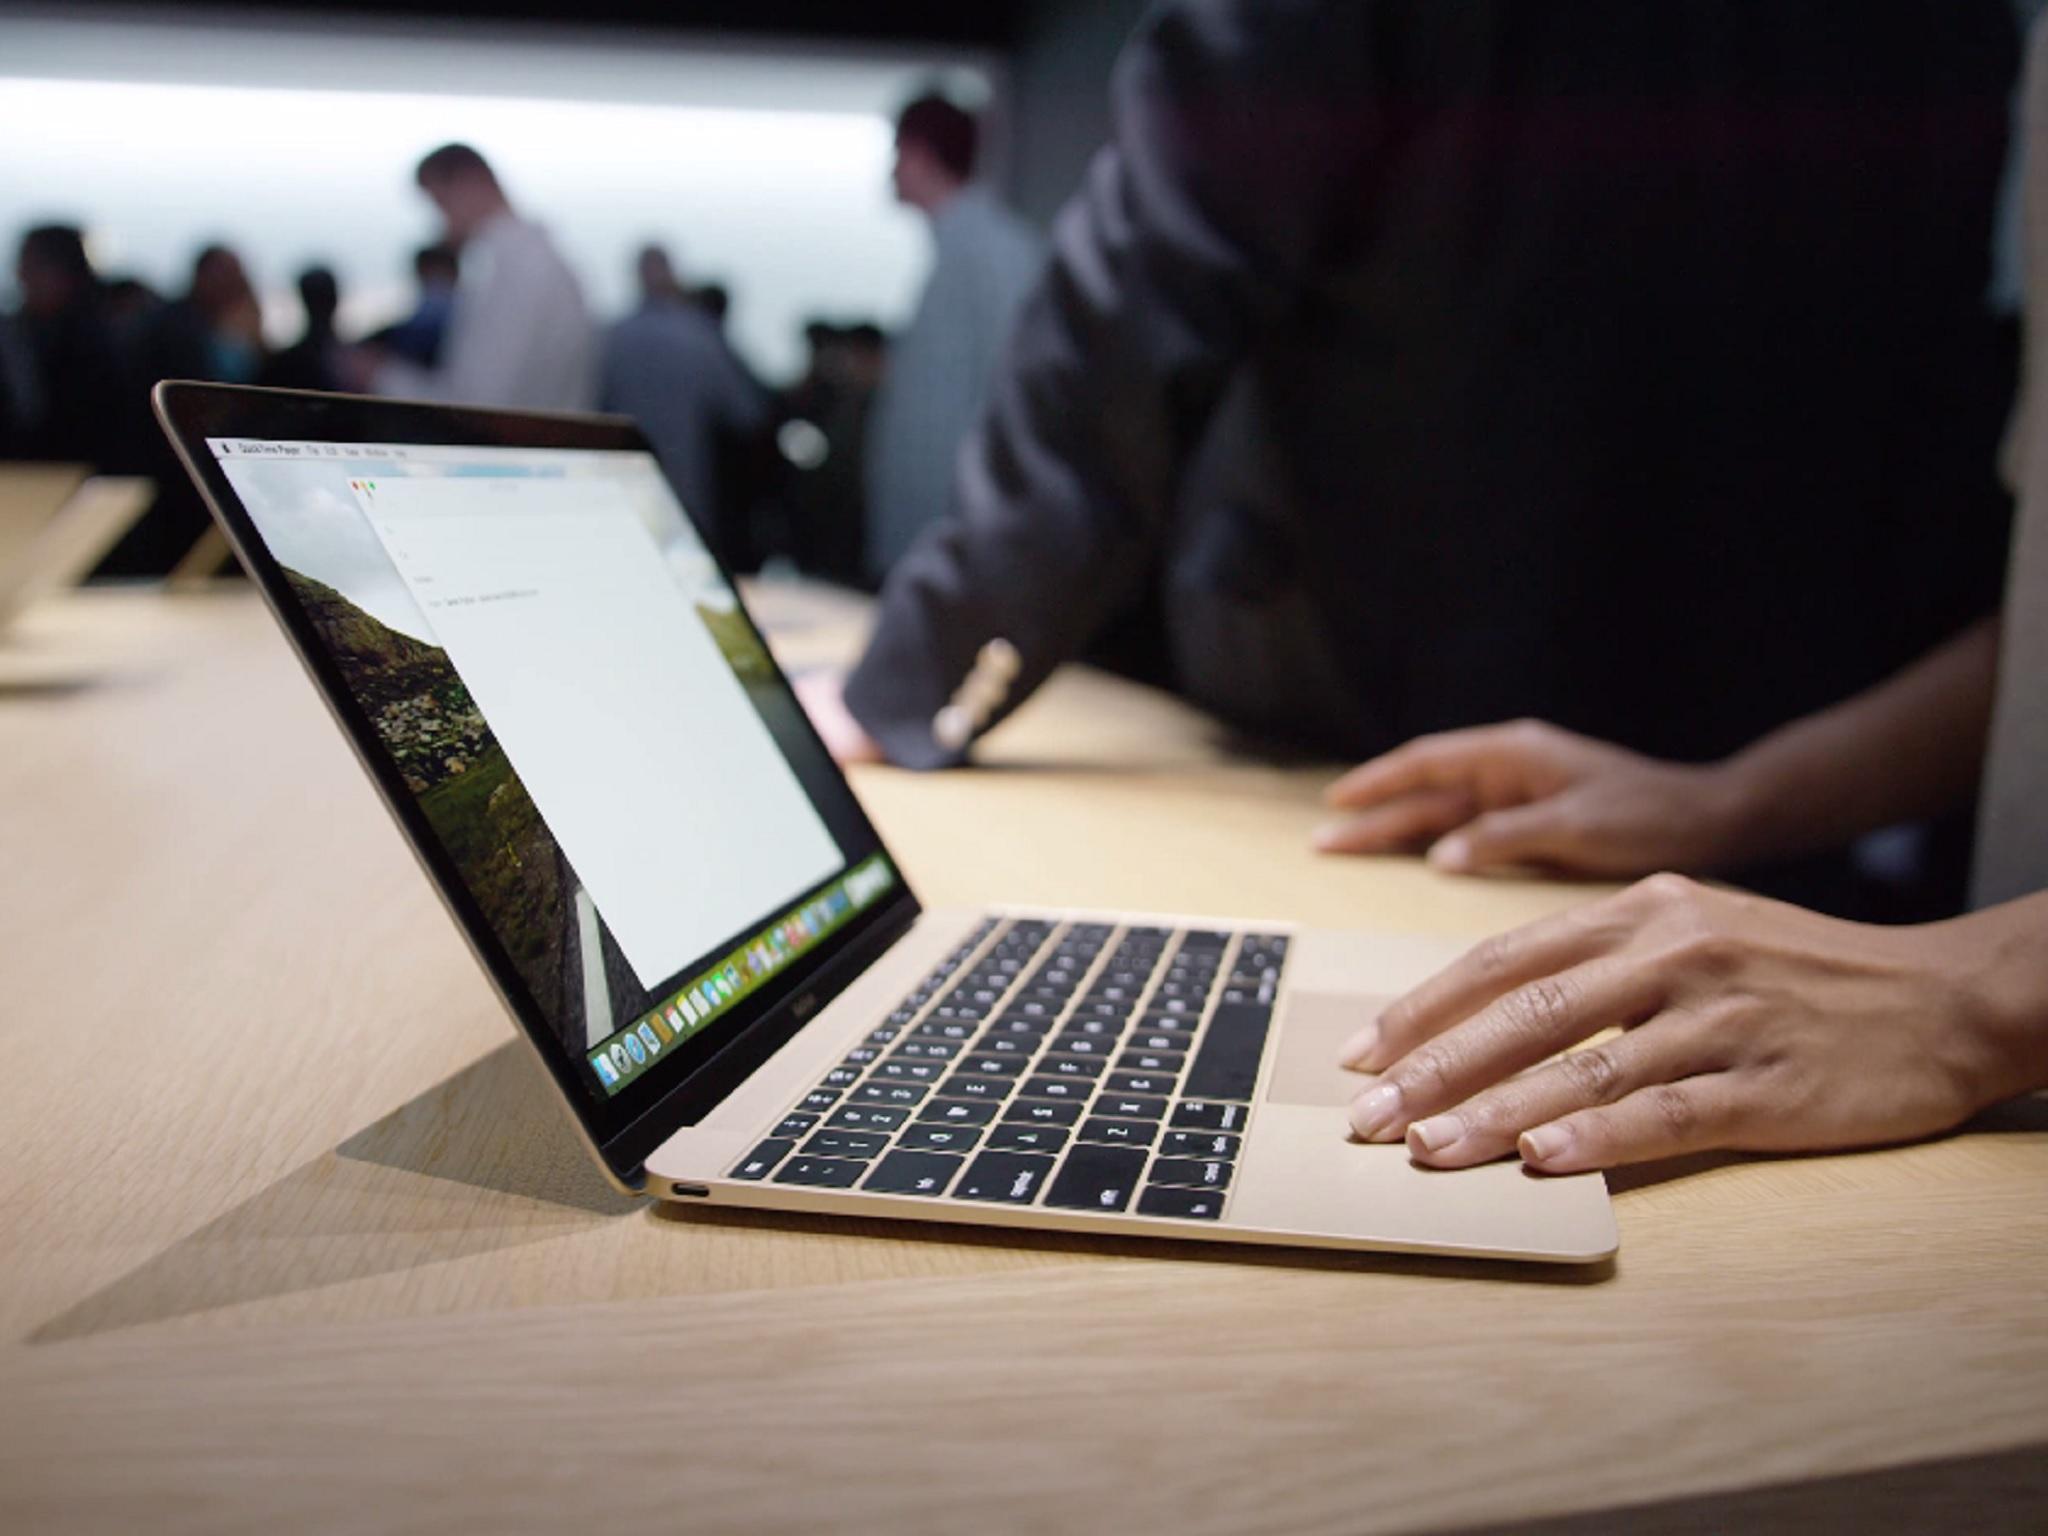 apple-macbook-charger-2015-port-usbc